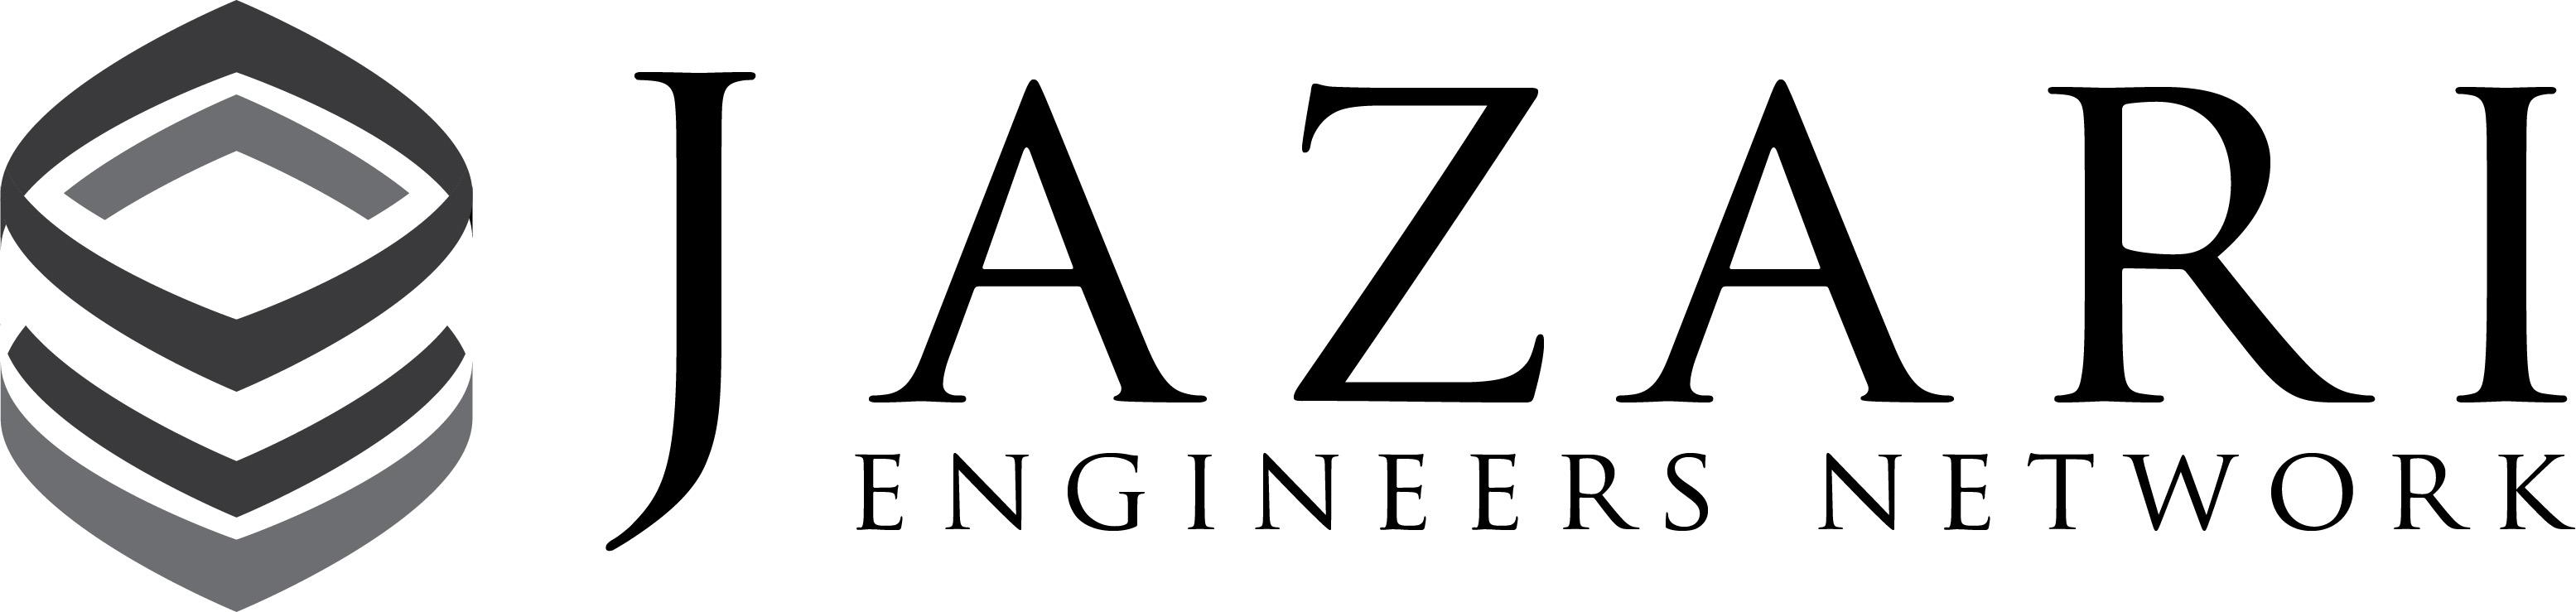 Jazari_Logo_Final-02-01-large.jpg